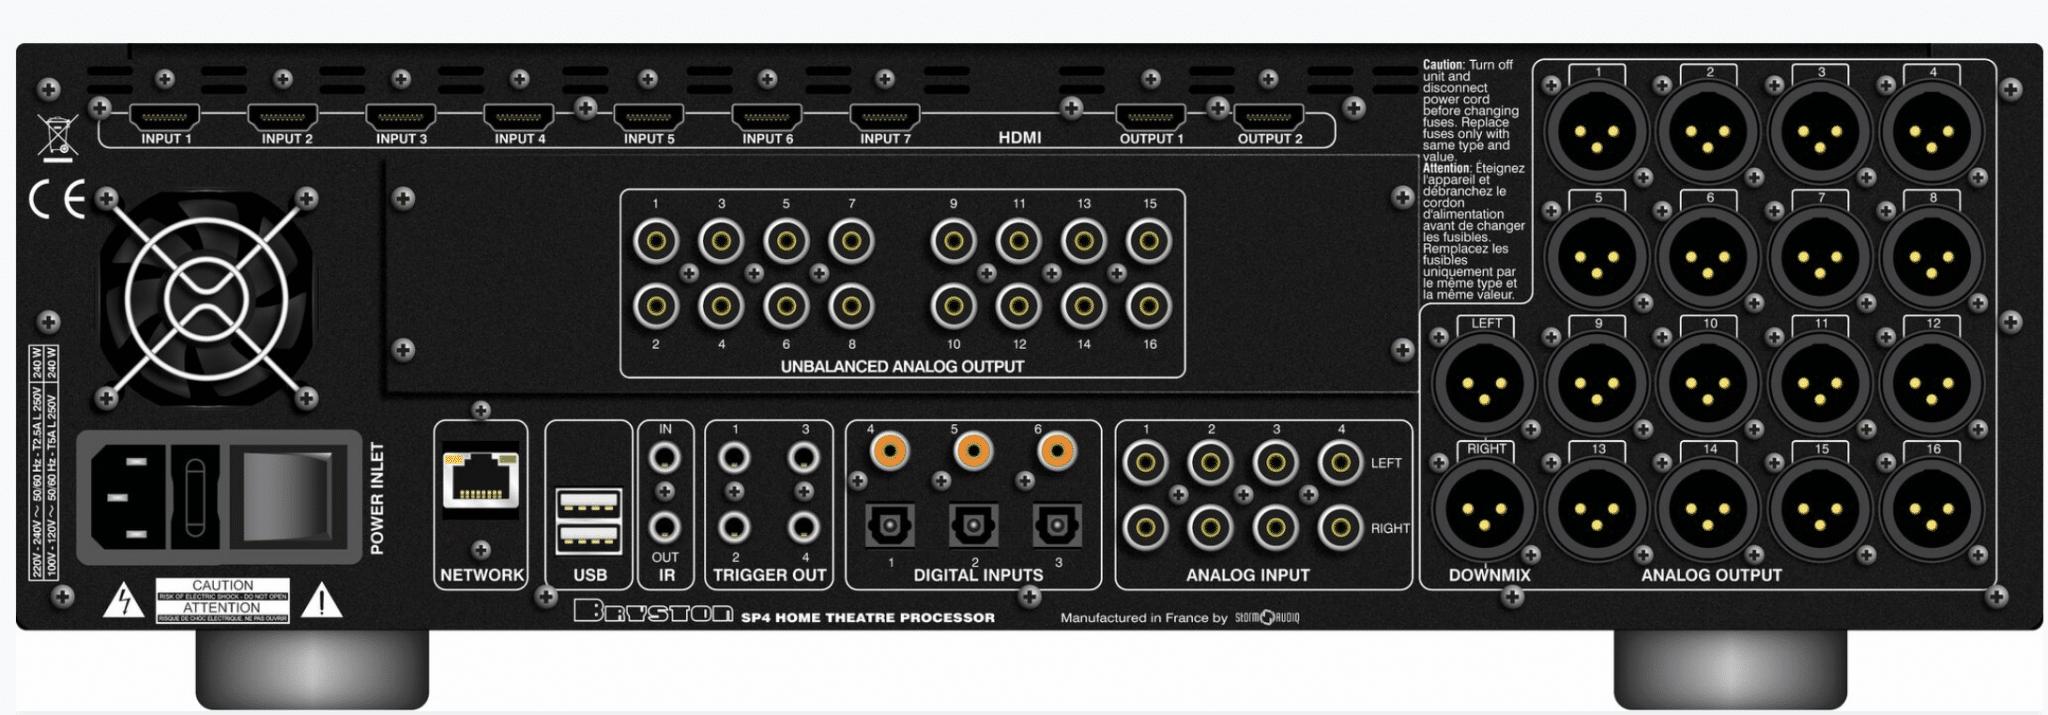 Spiksplinternieuw SP4 Surround Processor From Bryston - The Audiophile Man ZU-99